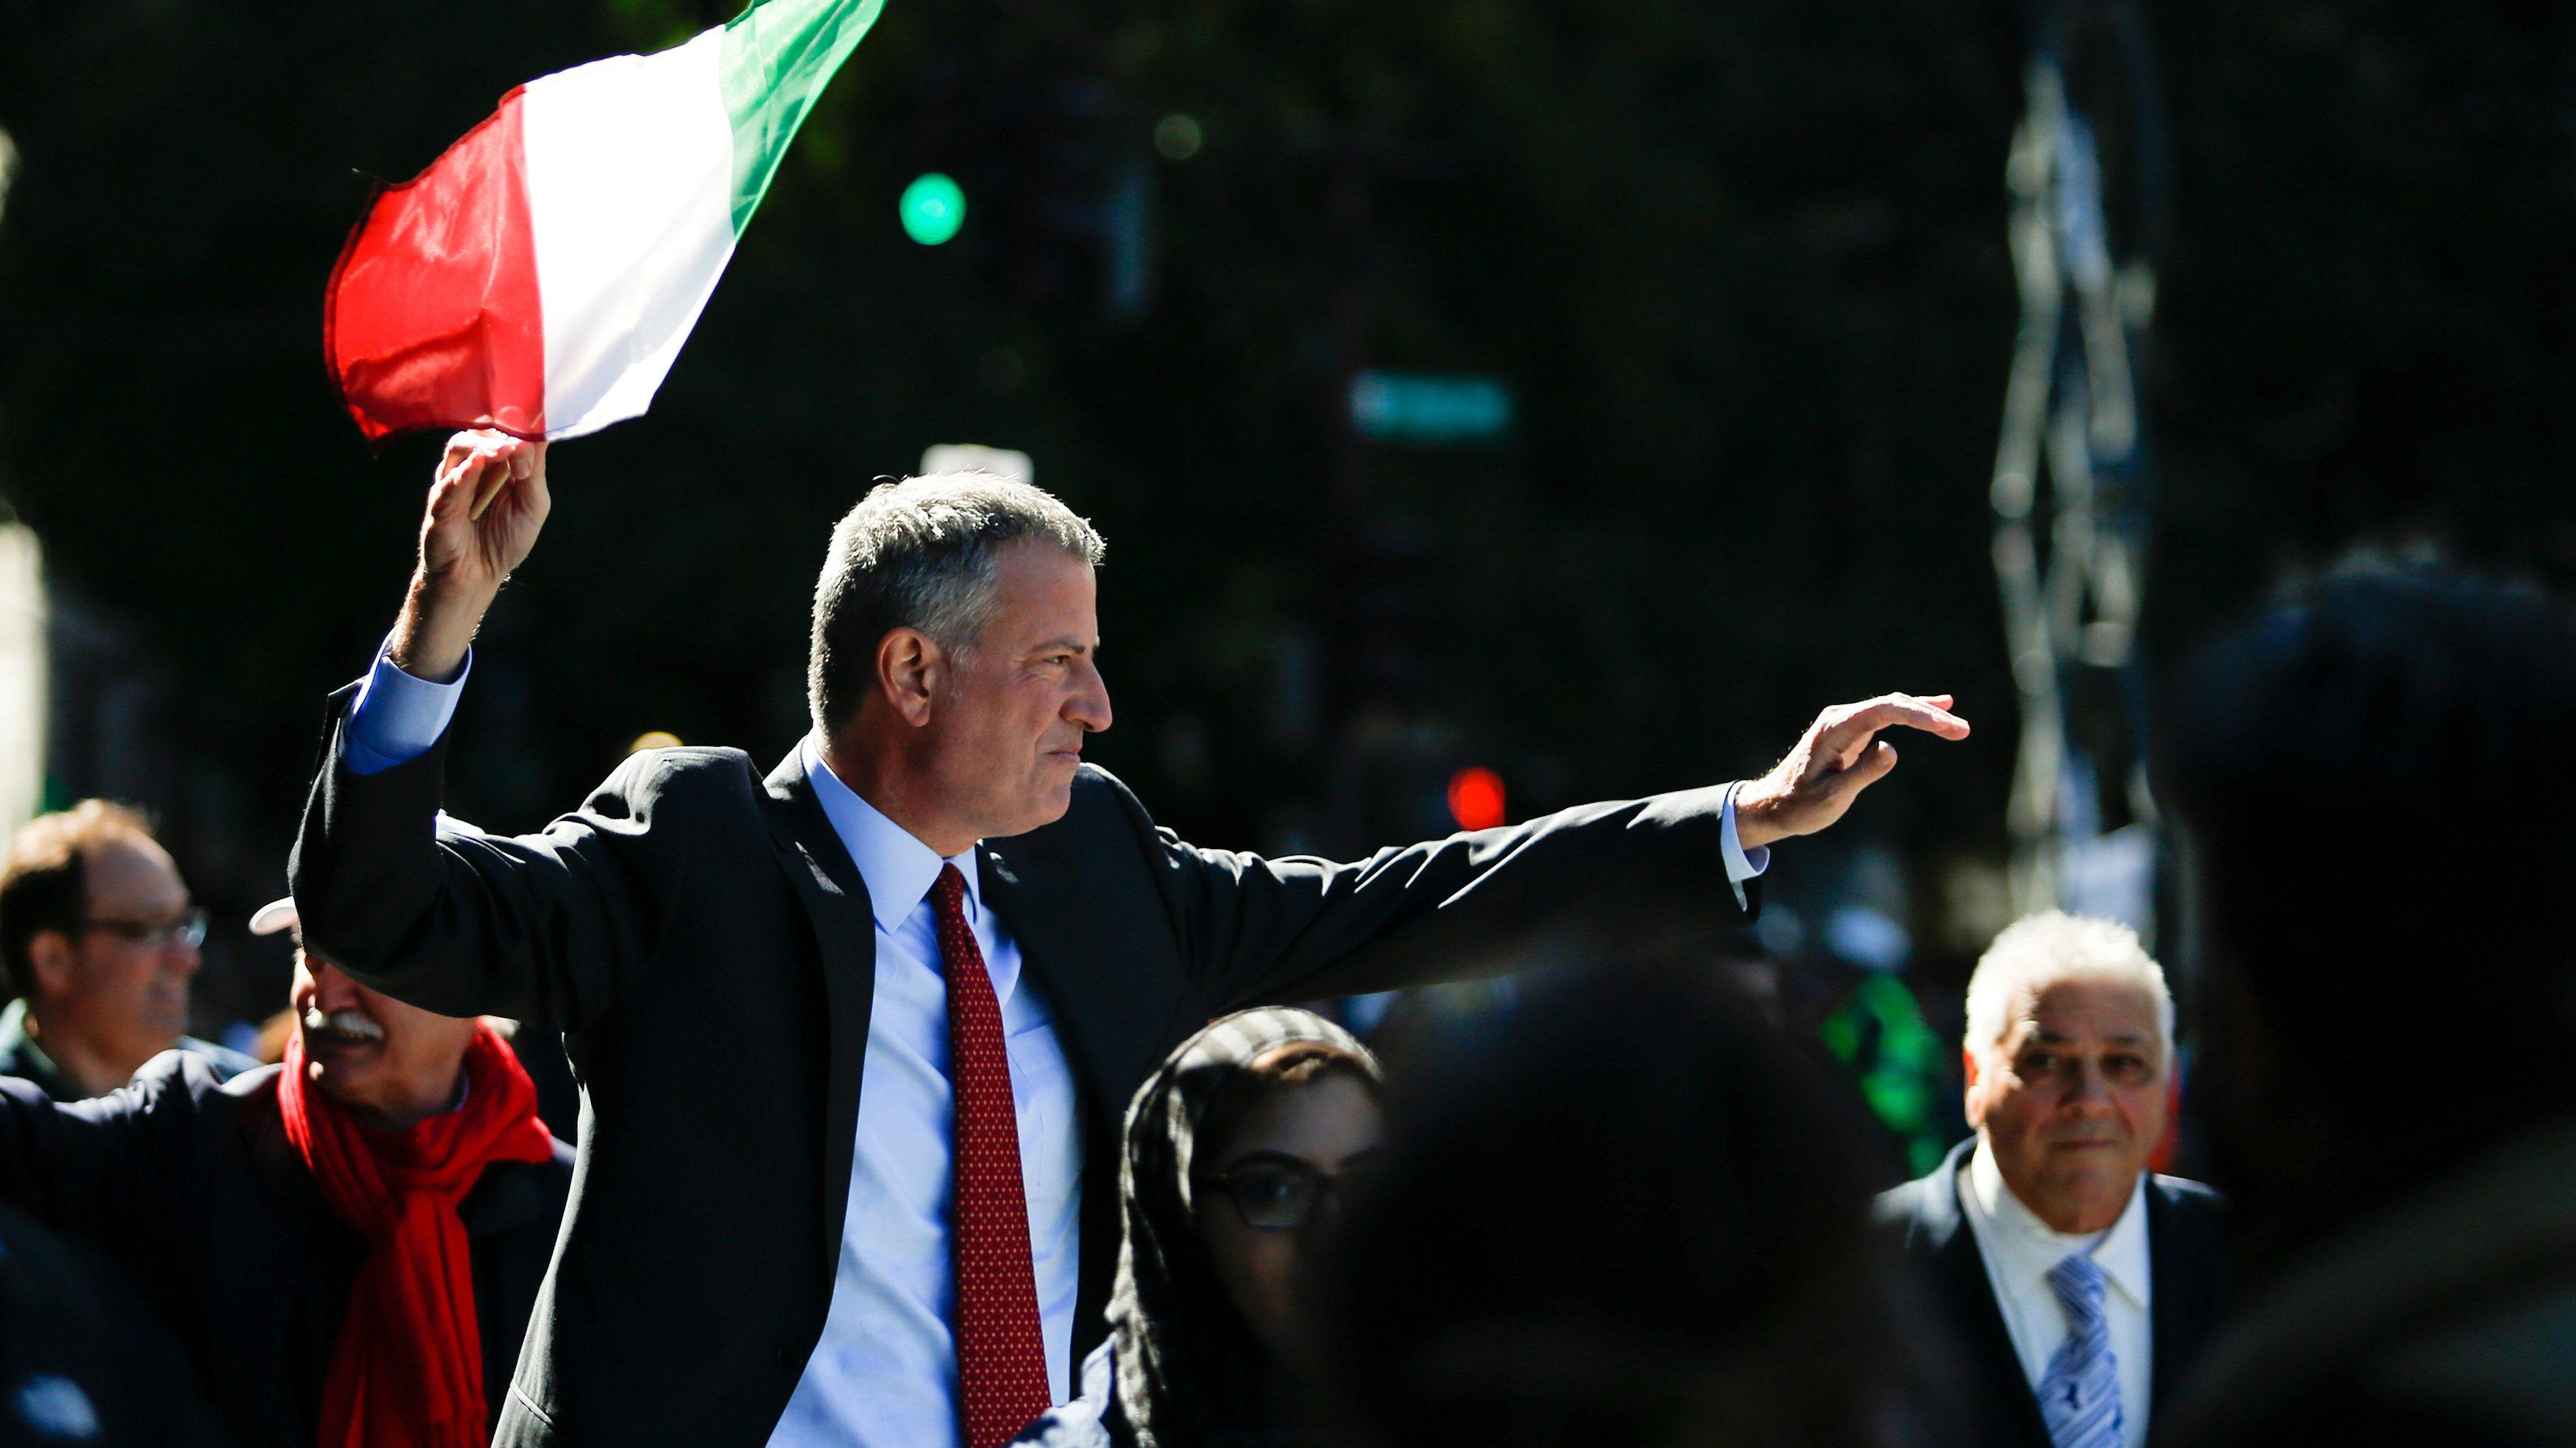 New York Mayor Bill de Blasio takes part in the 72nd Annual Columbus Day Parade in New York, U.S. October 10, 2016. REUTERS/Eduardo Munoz  - RTSRNSH